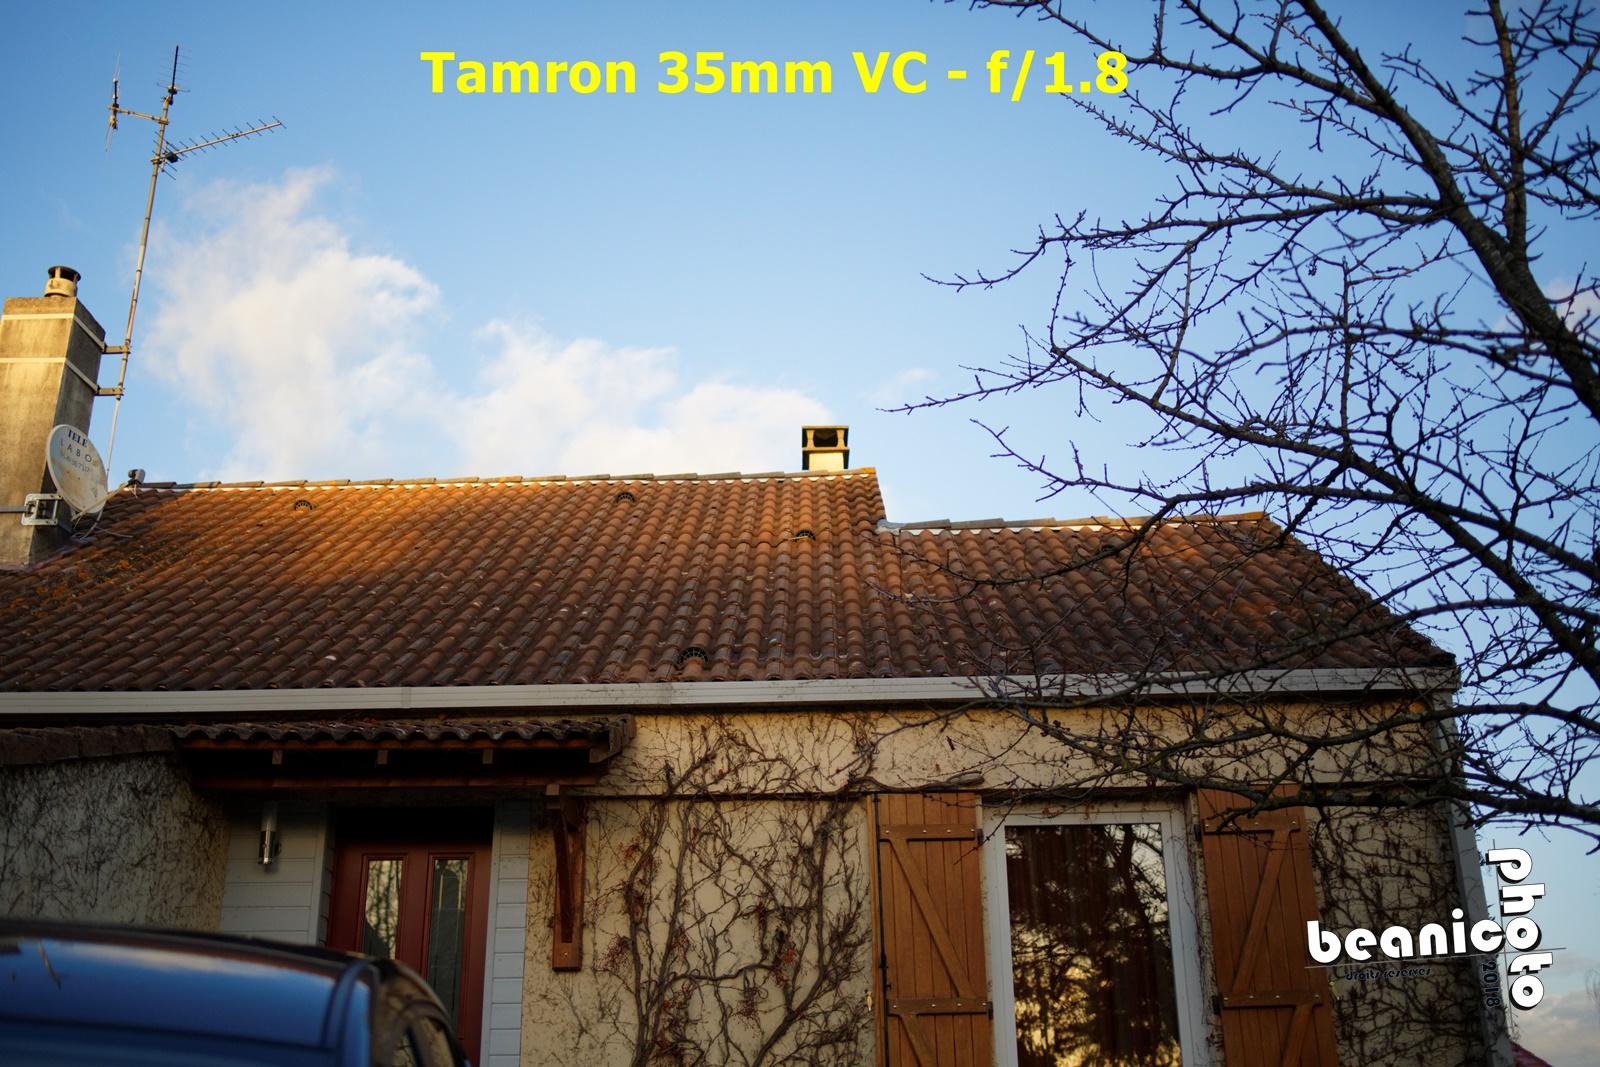 Test piqué d'image Tamron 35mm f/1.8 VC sur Canon Eos 5DIII - Beanico-photo.fr